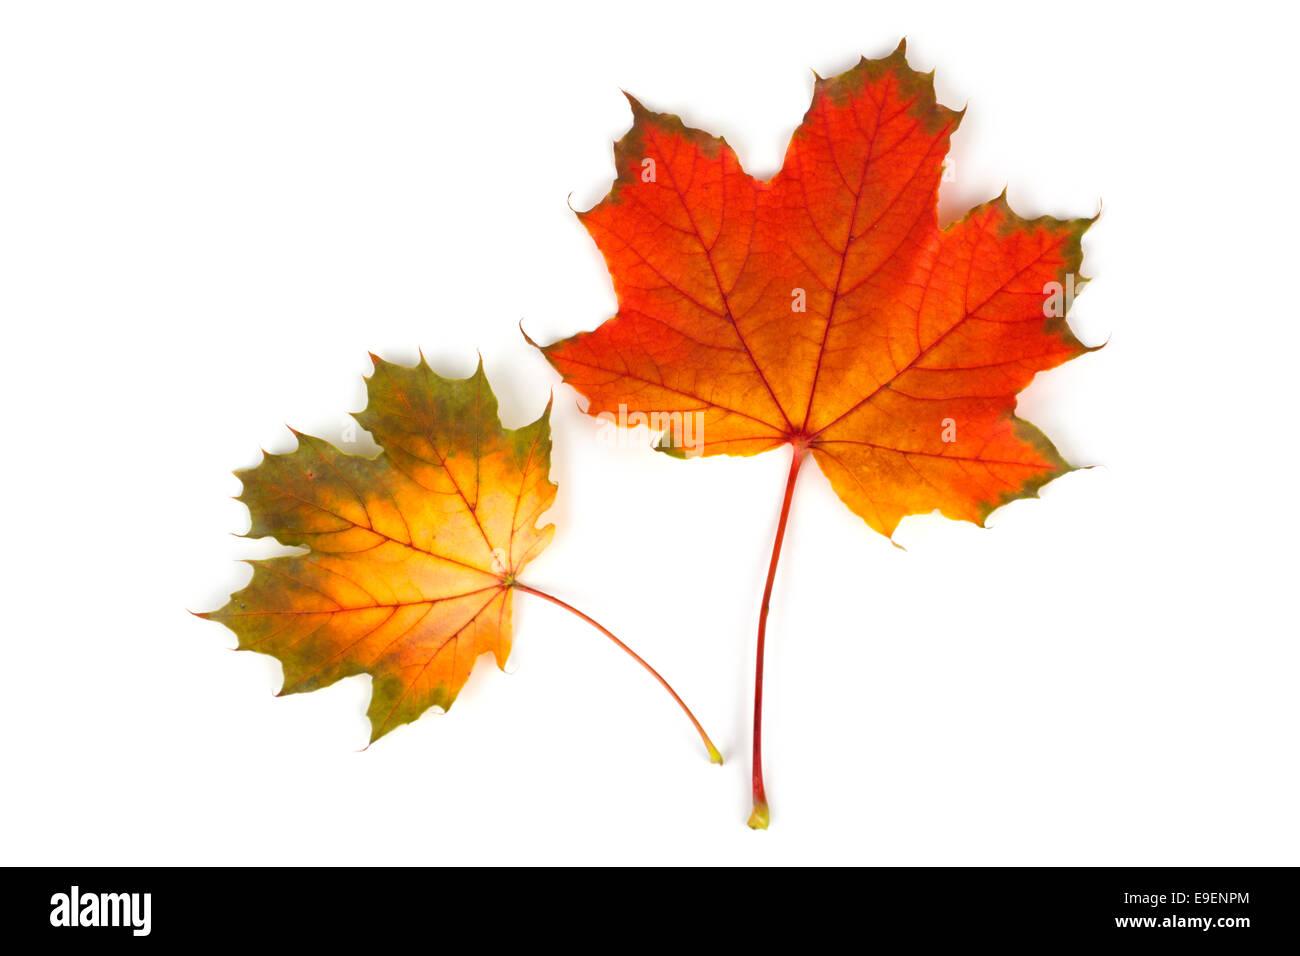 Maple Leaf Leaves Fall Autumn Colors Colours - Stock Image